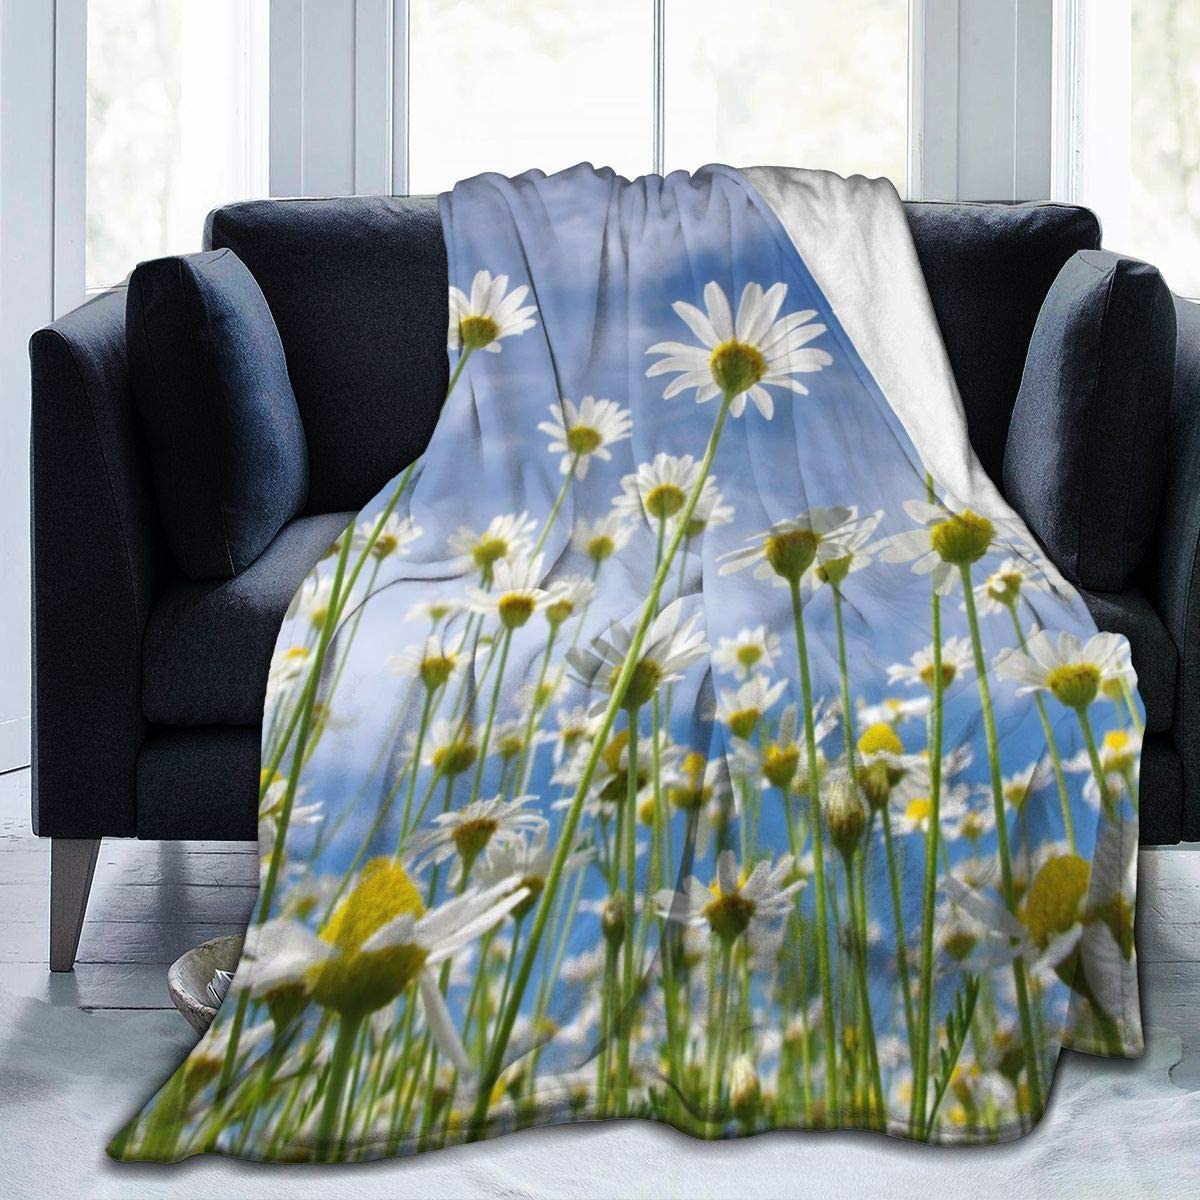 Micro Fleece Plush Soft Baby Blanket Beautiful Cute White Daisies Floral Flowers Fluffy Warm Toddler Bed/Crib Blanket Lightweight Flannel Daycare Nap Kids Sleeping Tummy Time Throw Blanket Girls Boy K